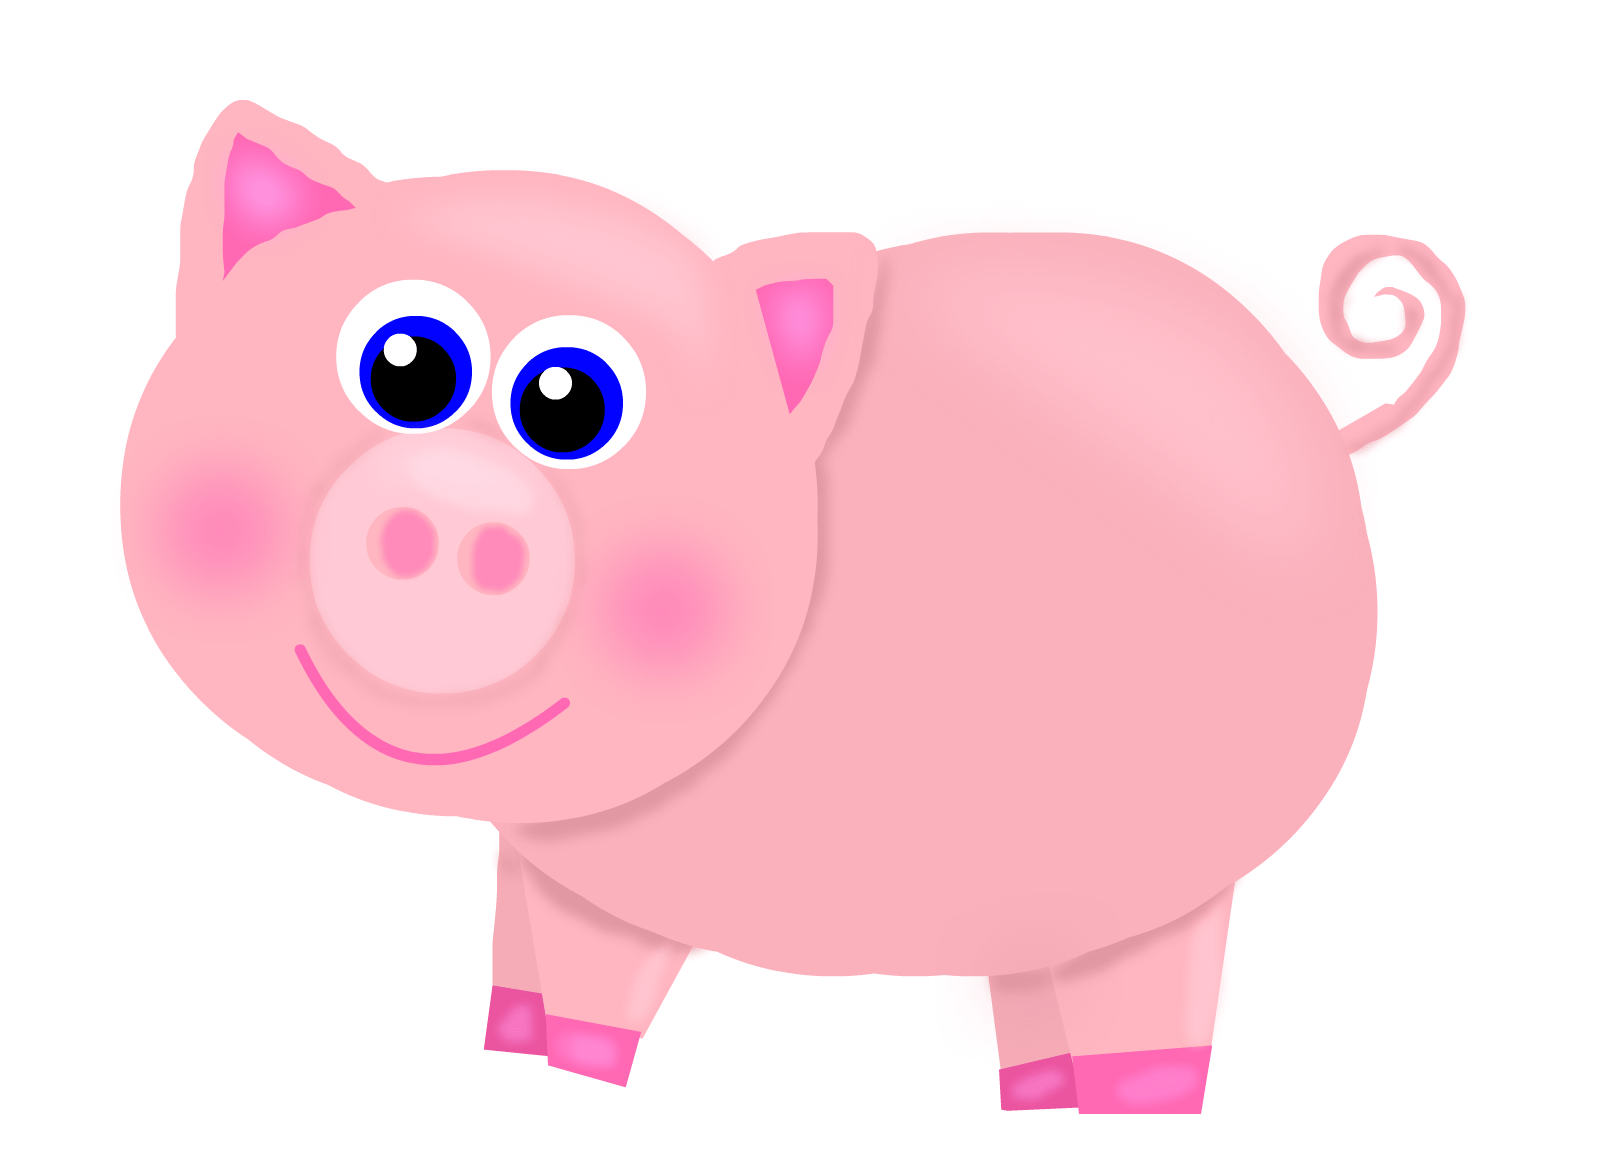 Cute Piggies Wallpaper Pig Pictures Kids Search